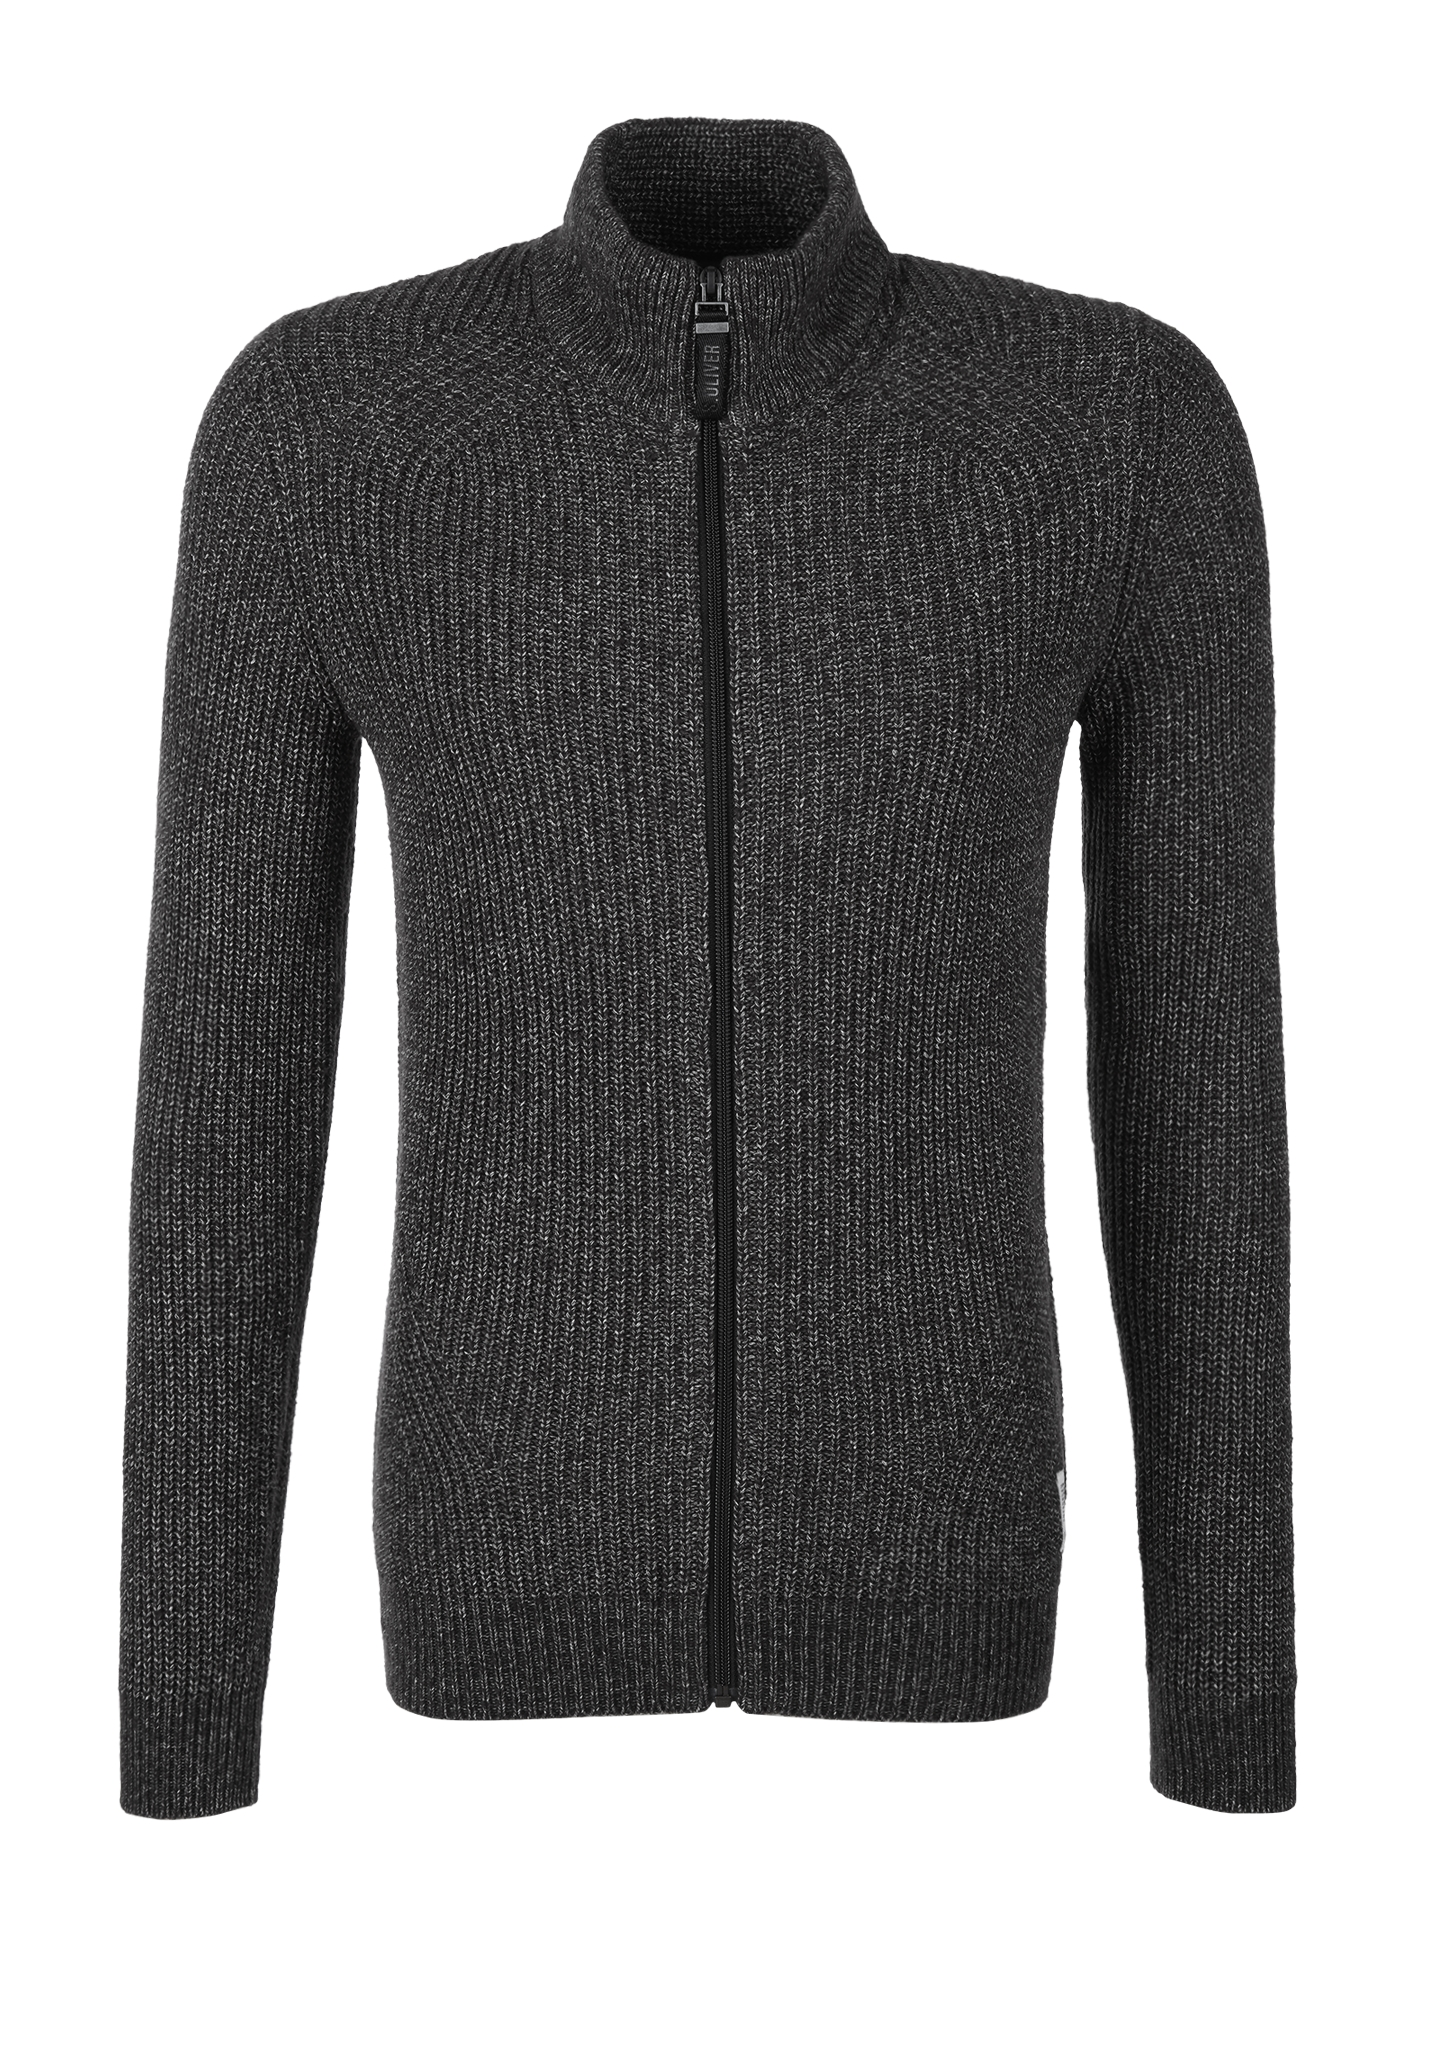 Strickjacke | Bekleidung > Strickjacken & Cardigans | Grau | 52% baumwolle -  48% polyacryl | s.Oliver